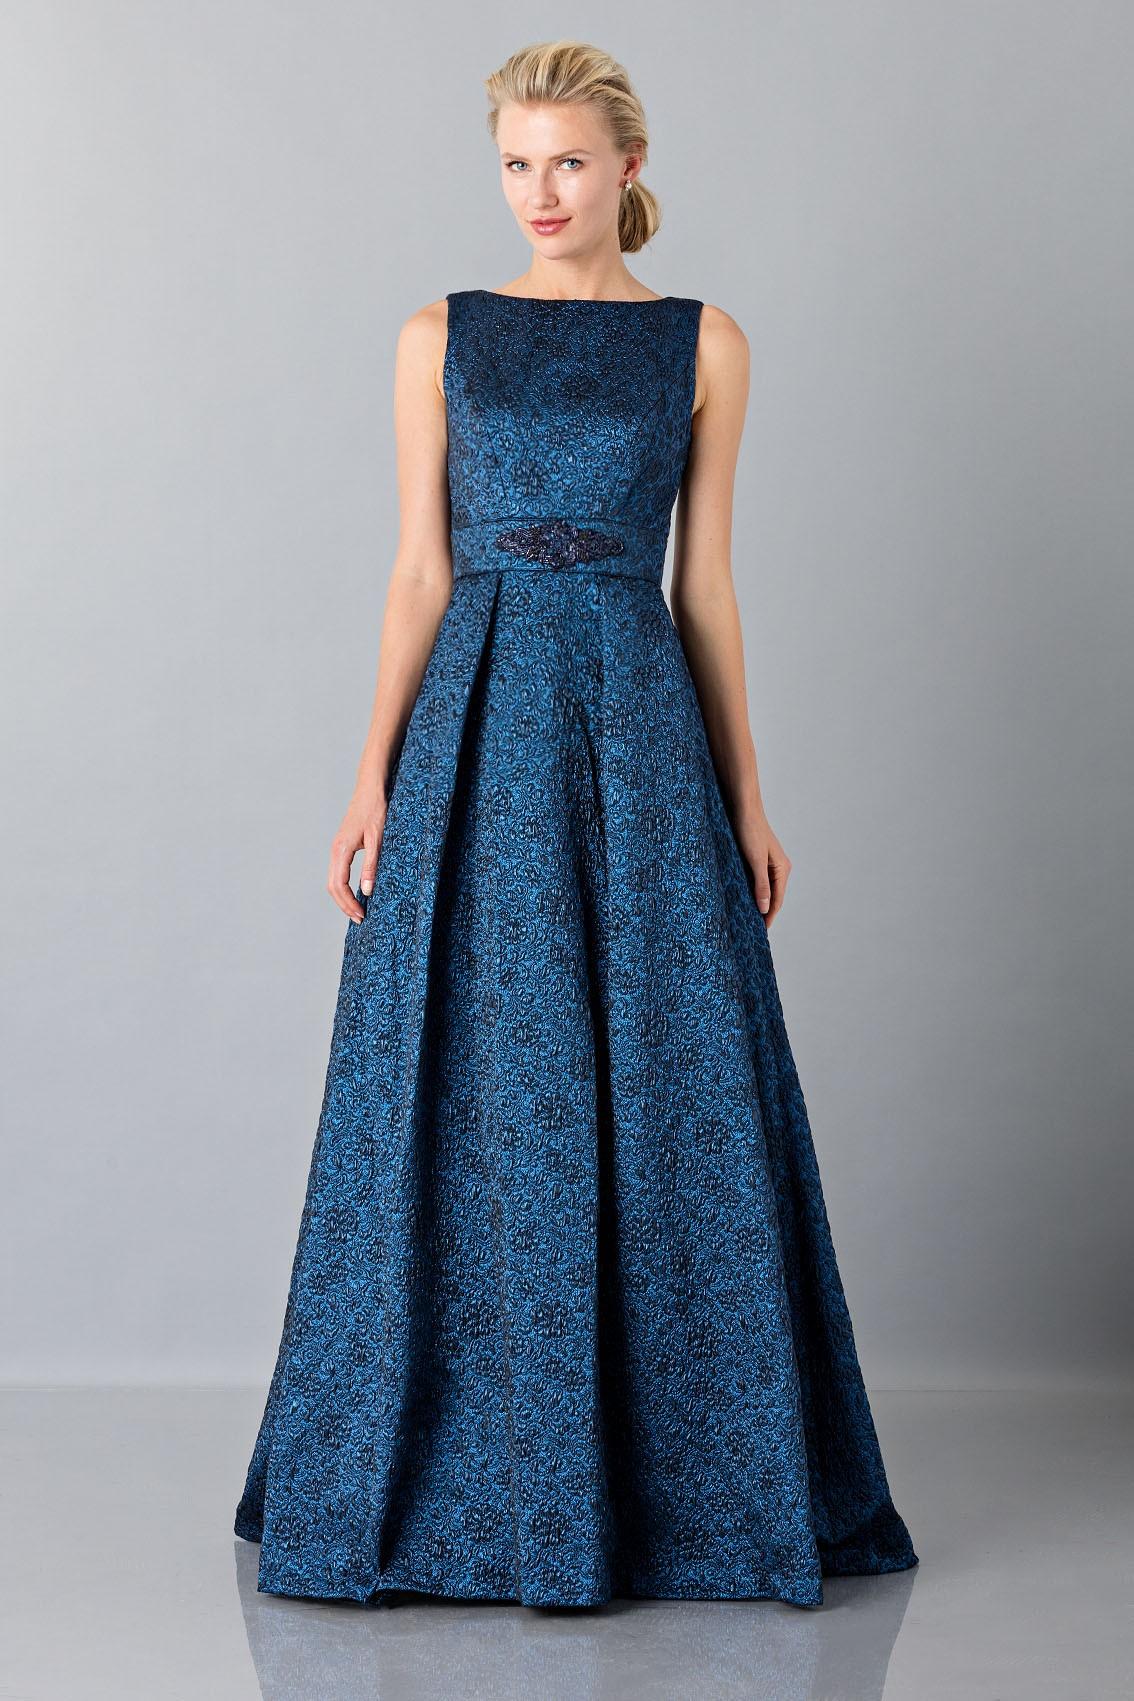 Rent a Theia dress Light blue dress with detail at the waist